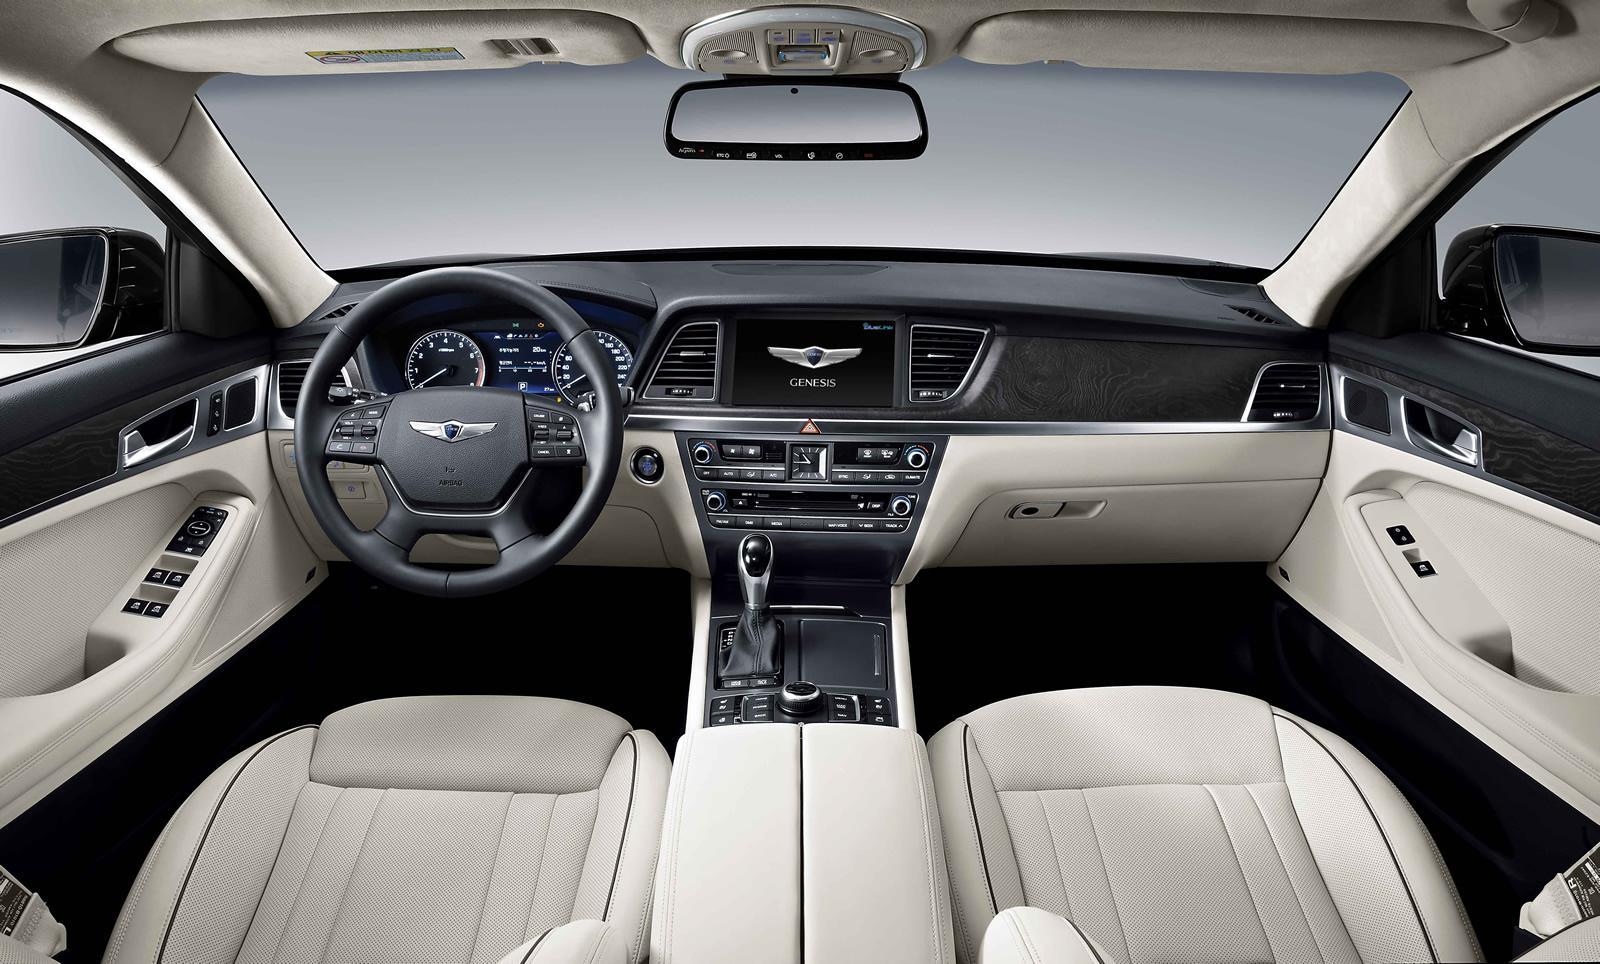 2015 Hyundai Sonata Hybrid >> 2015 Hyundai Genesis US Pricing and Equipment Announced - autoevolution